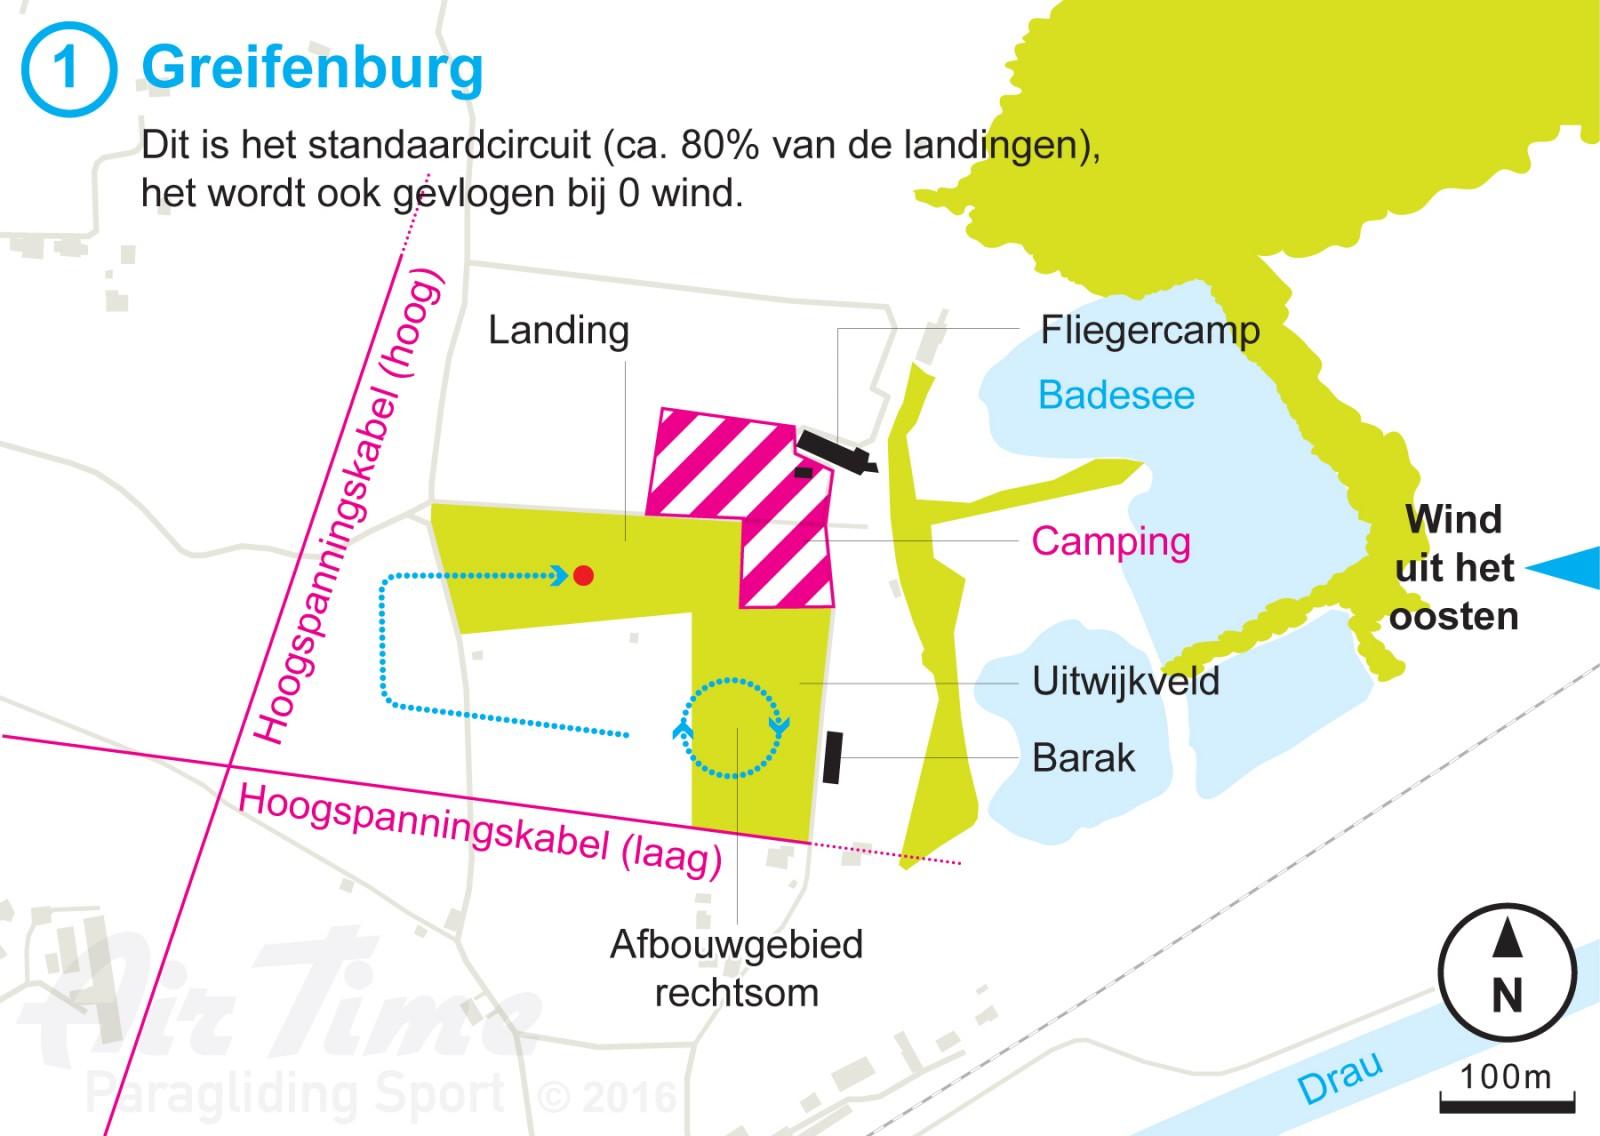 Air Time Paragliding Sport Circuit Landing Greifenburg oostwind